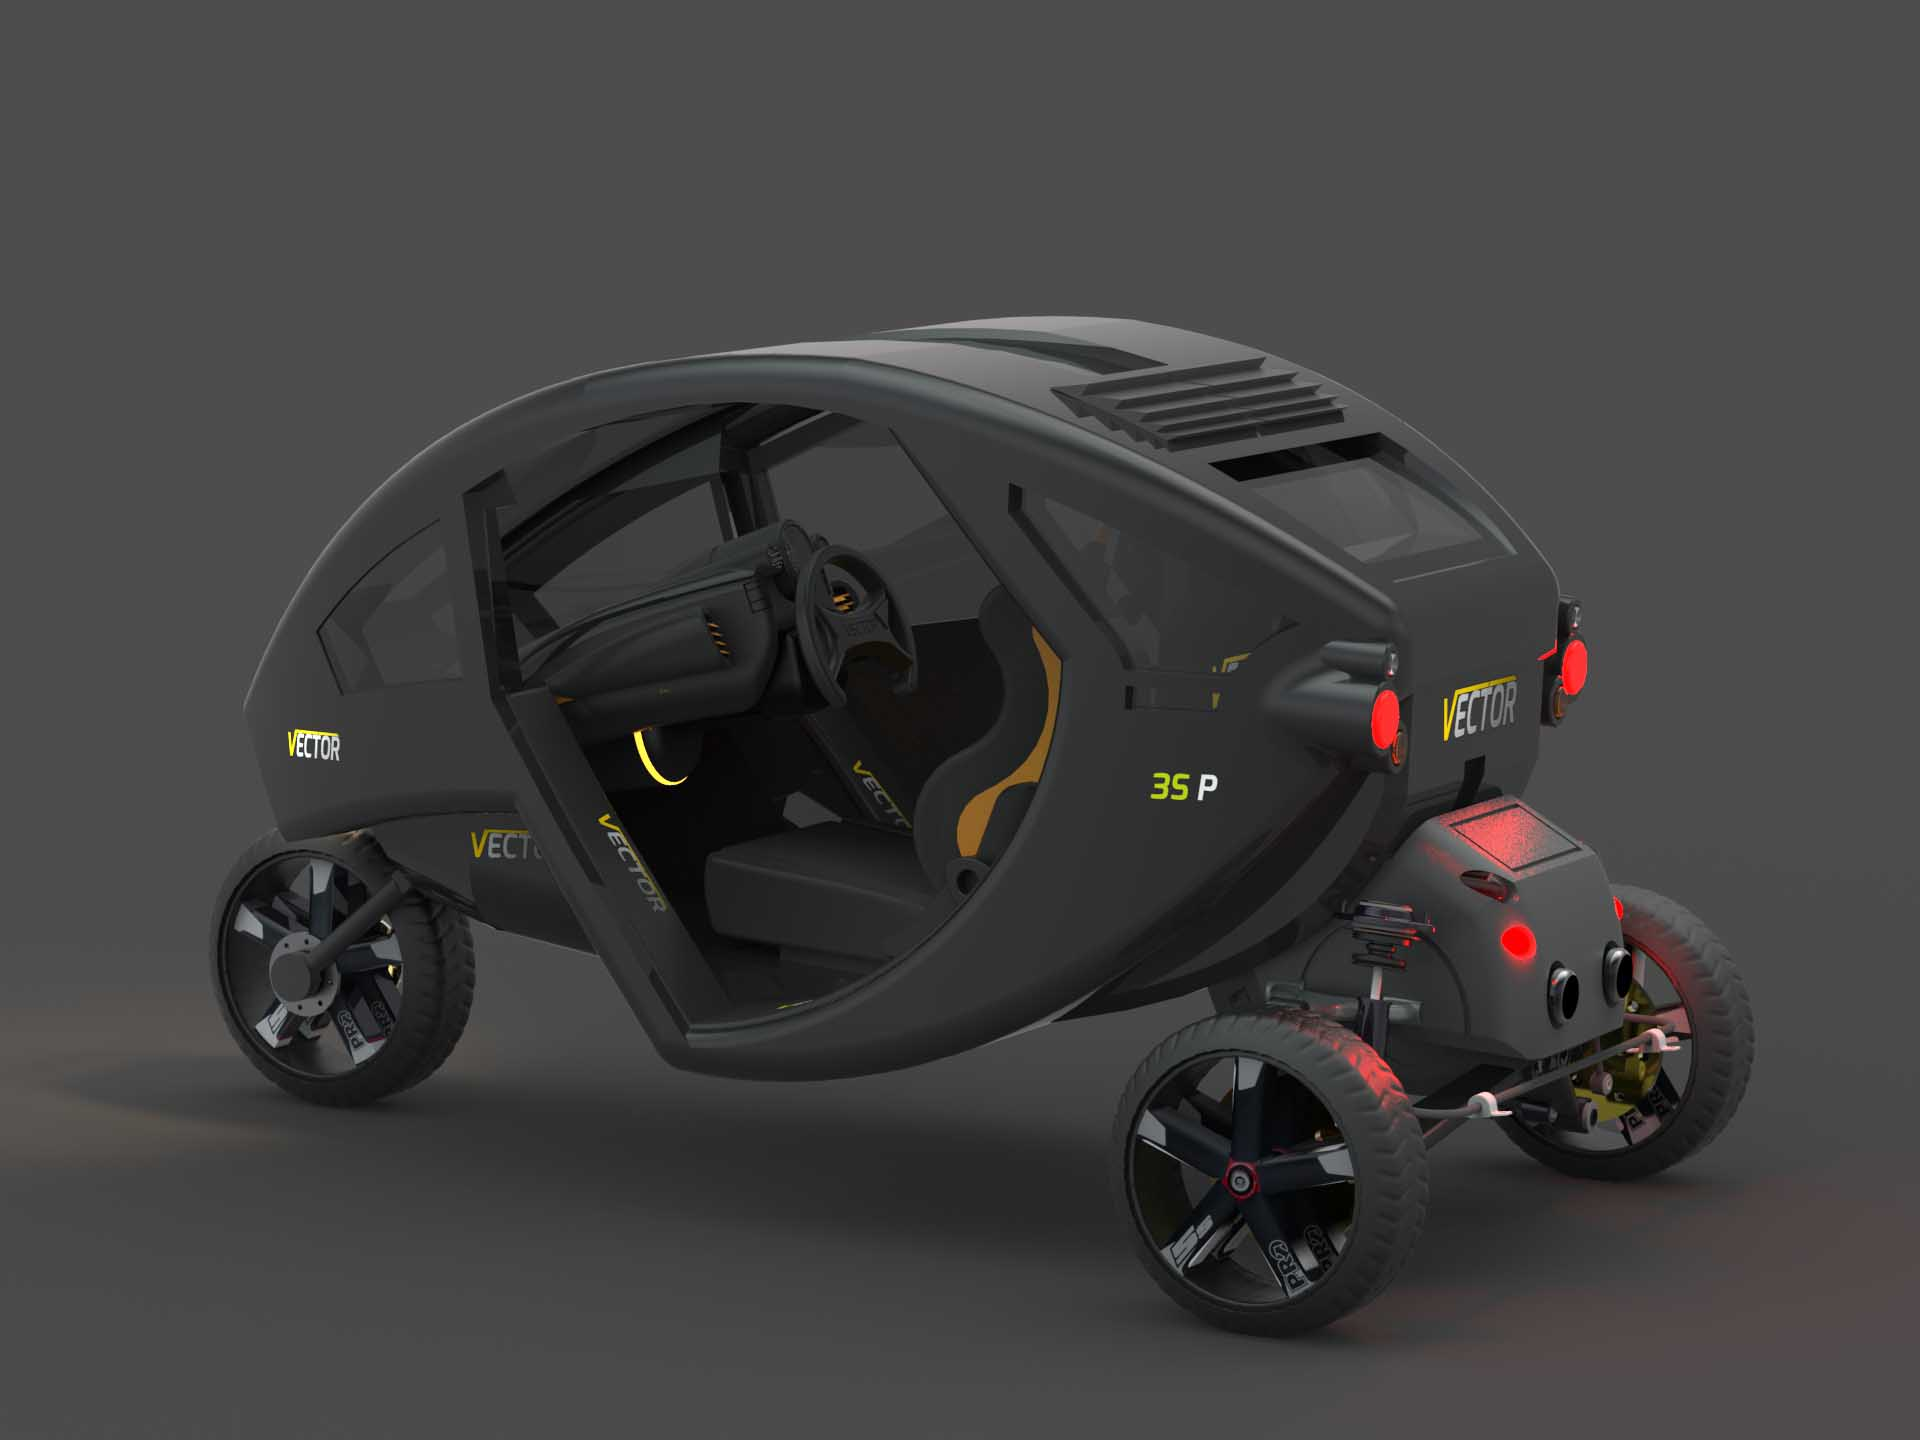 Vector Automobile designed by BMK